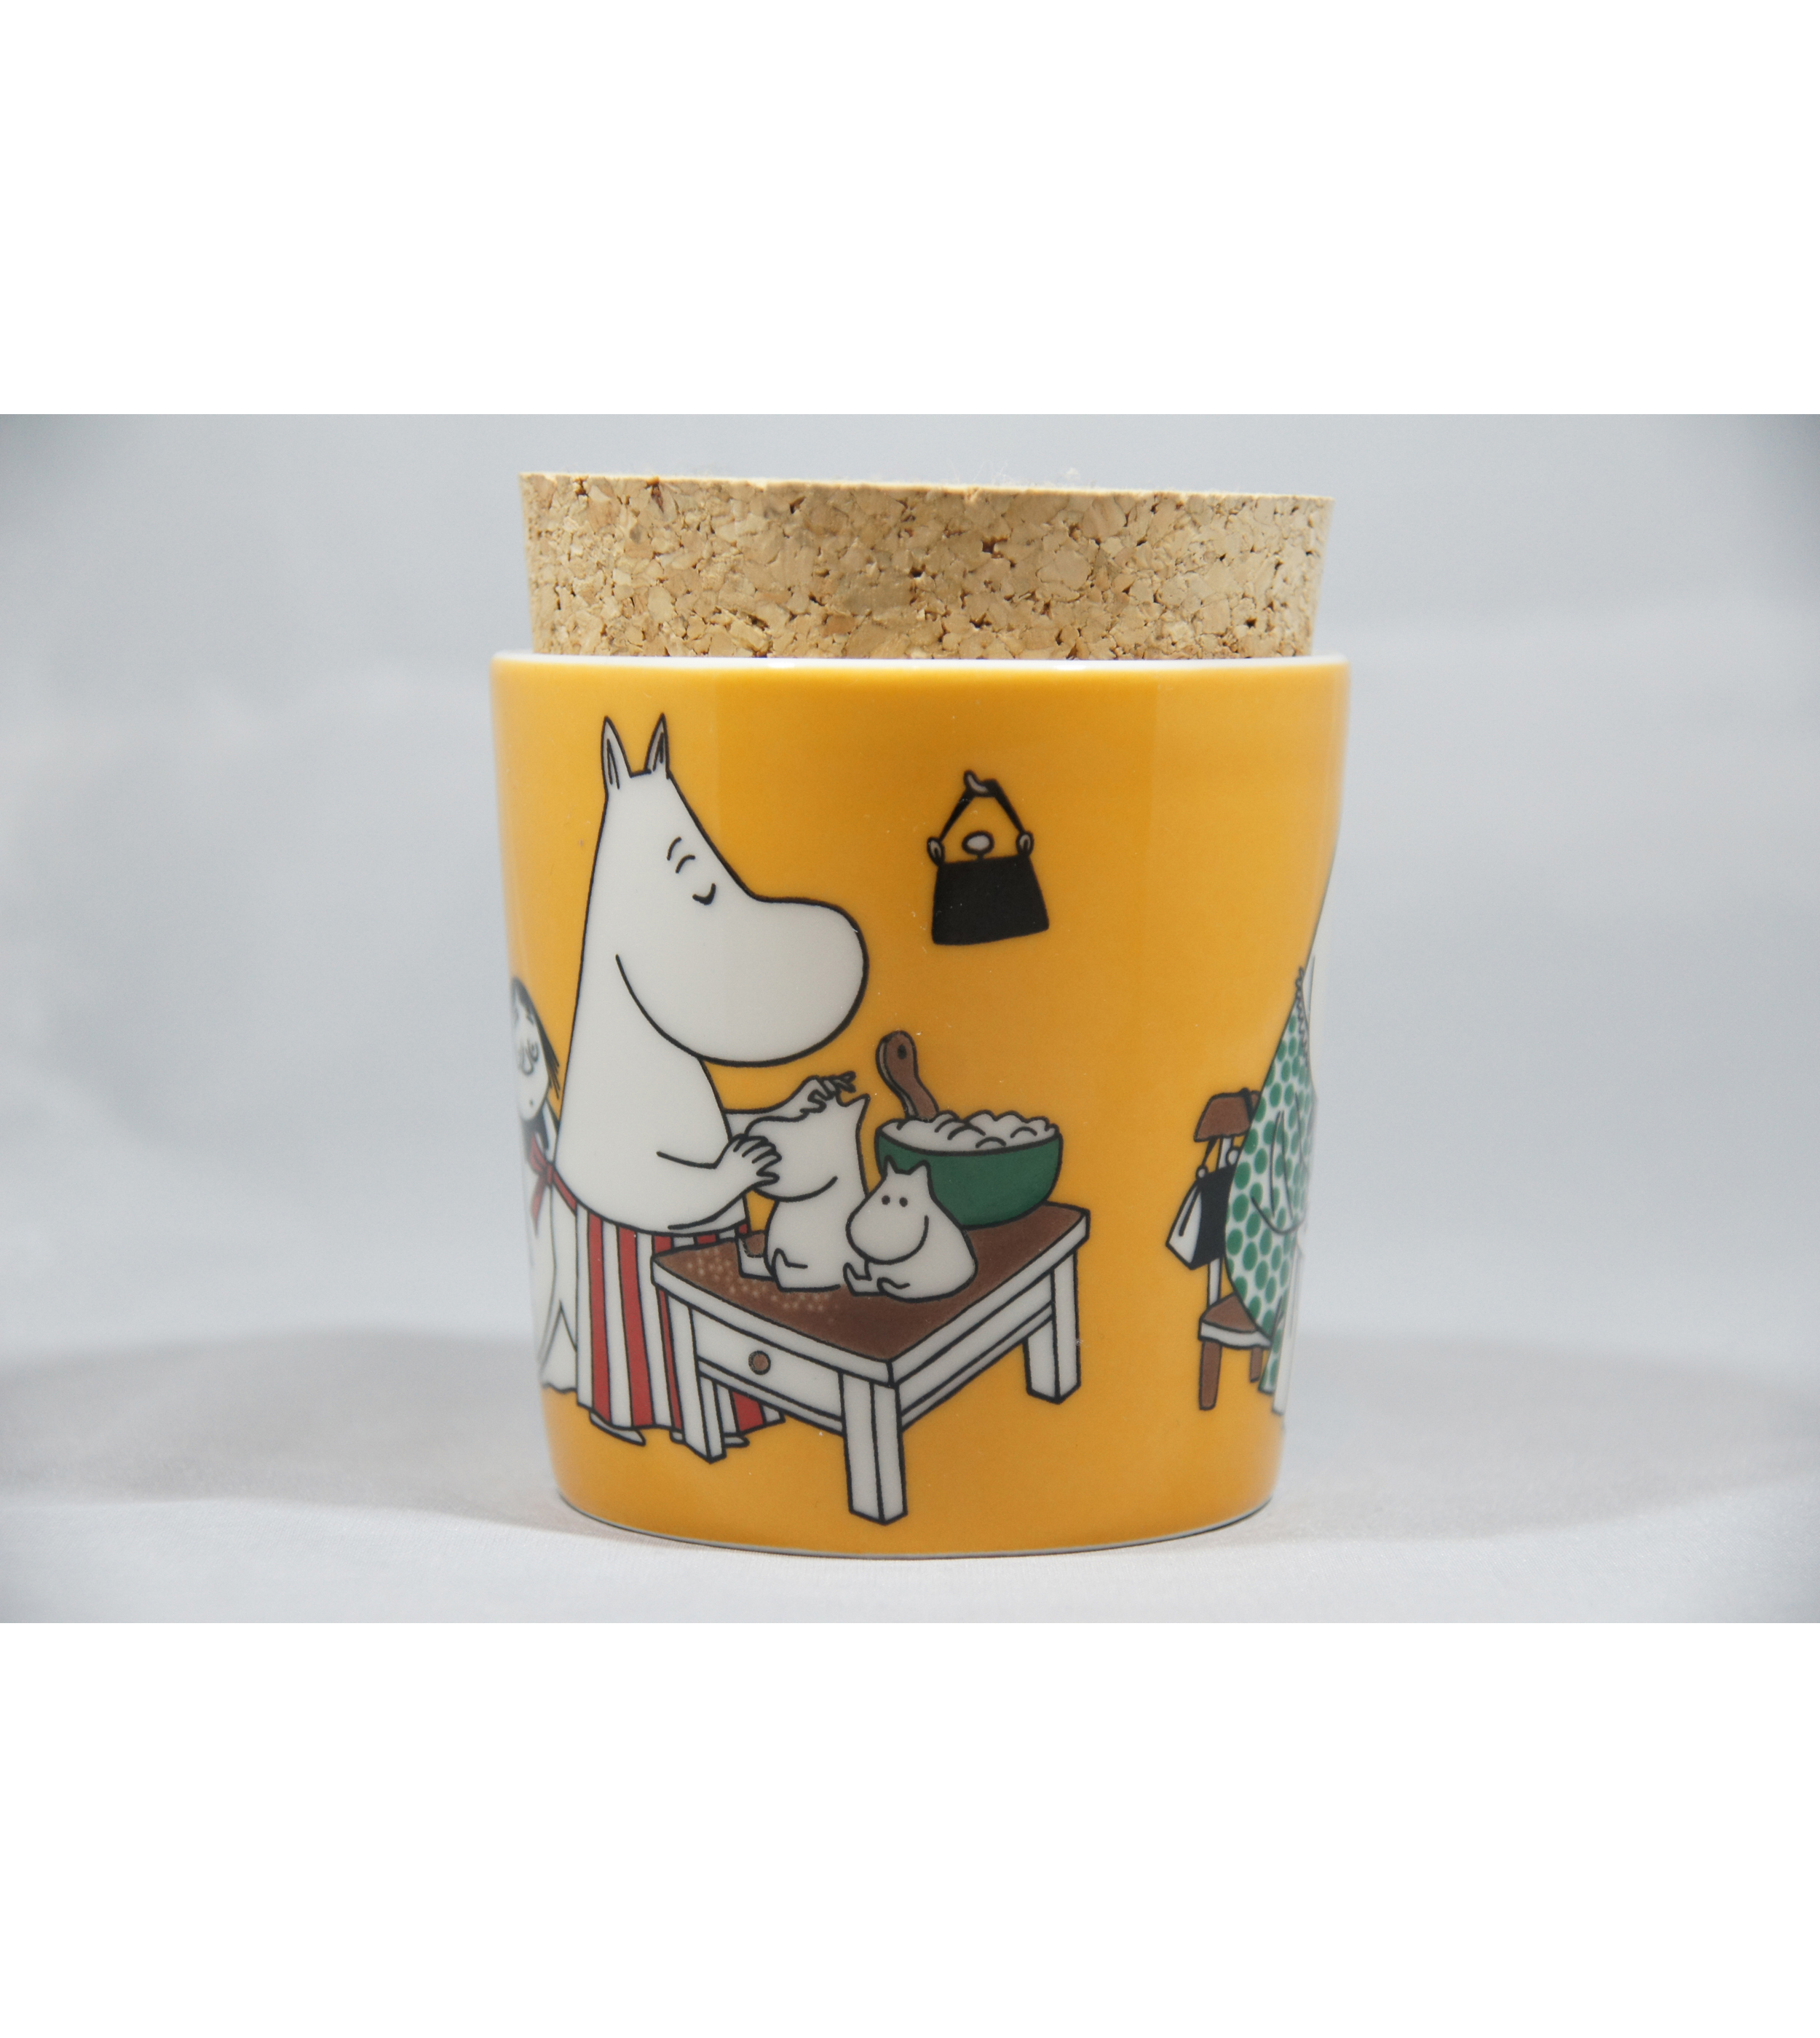 Moomin Jar Moomin Mamma's Day